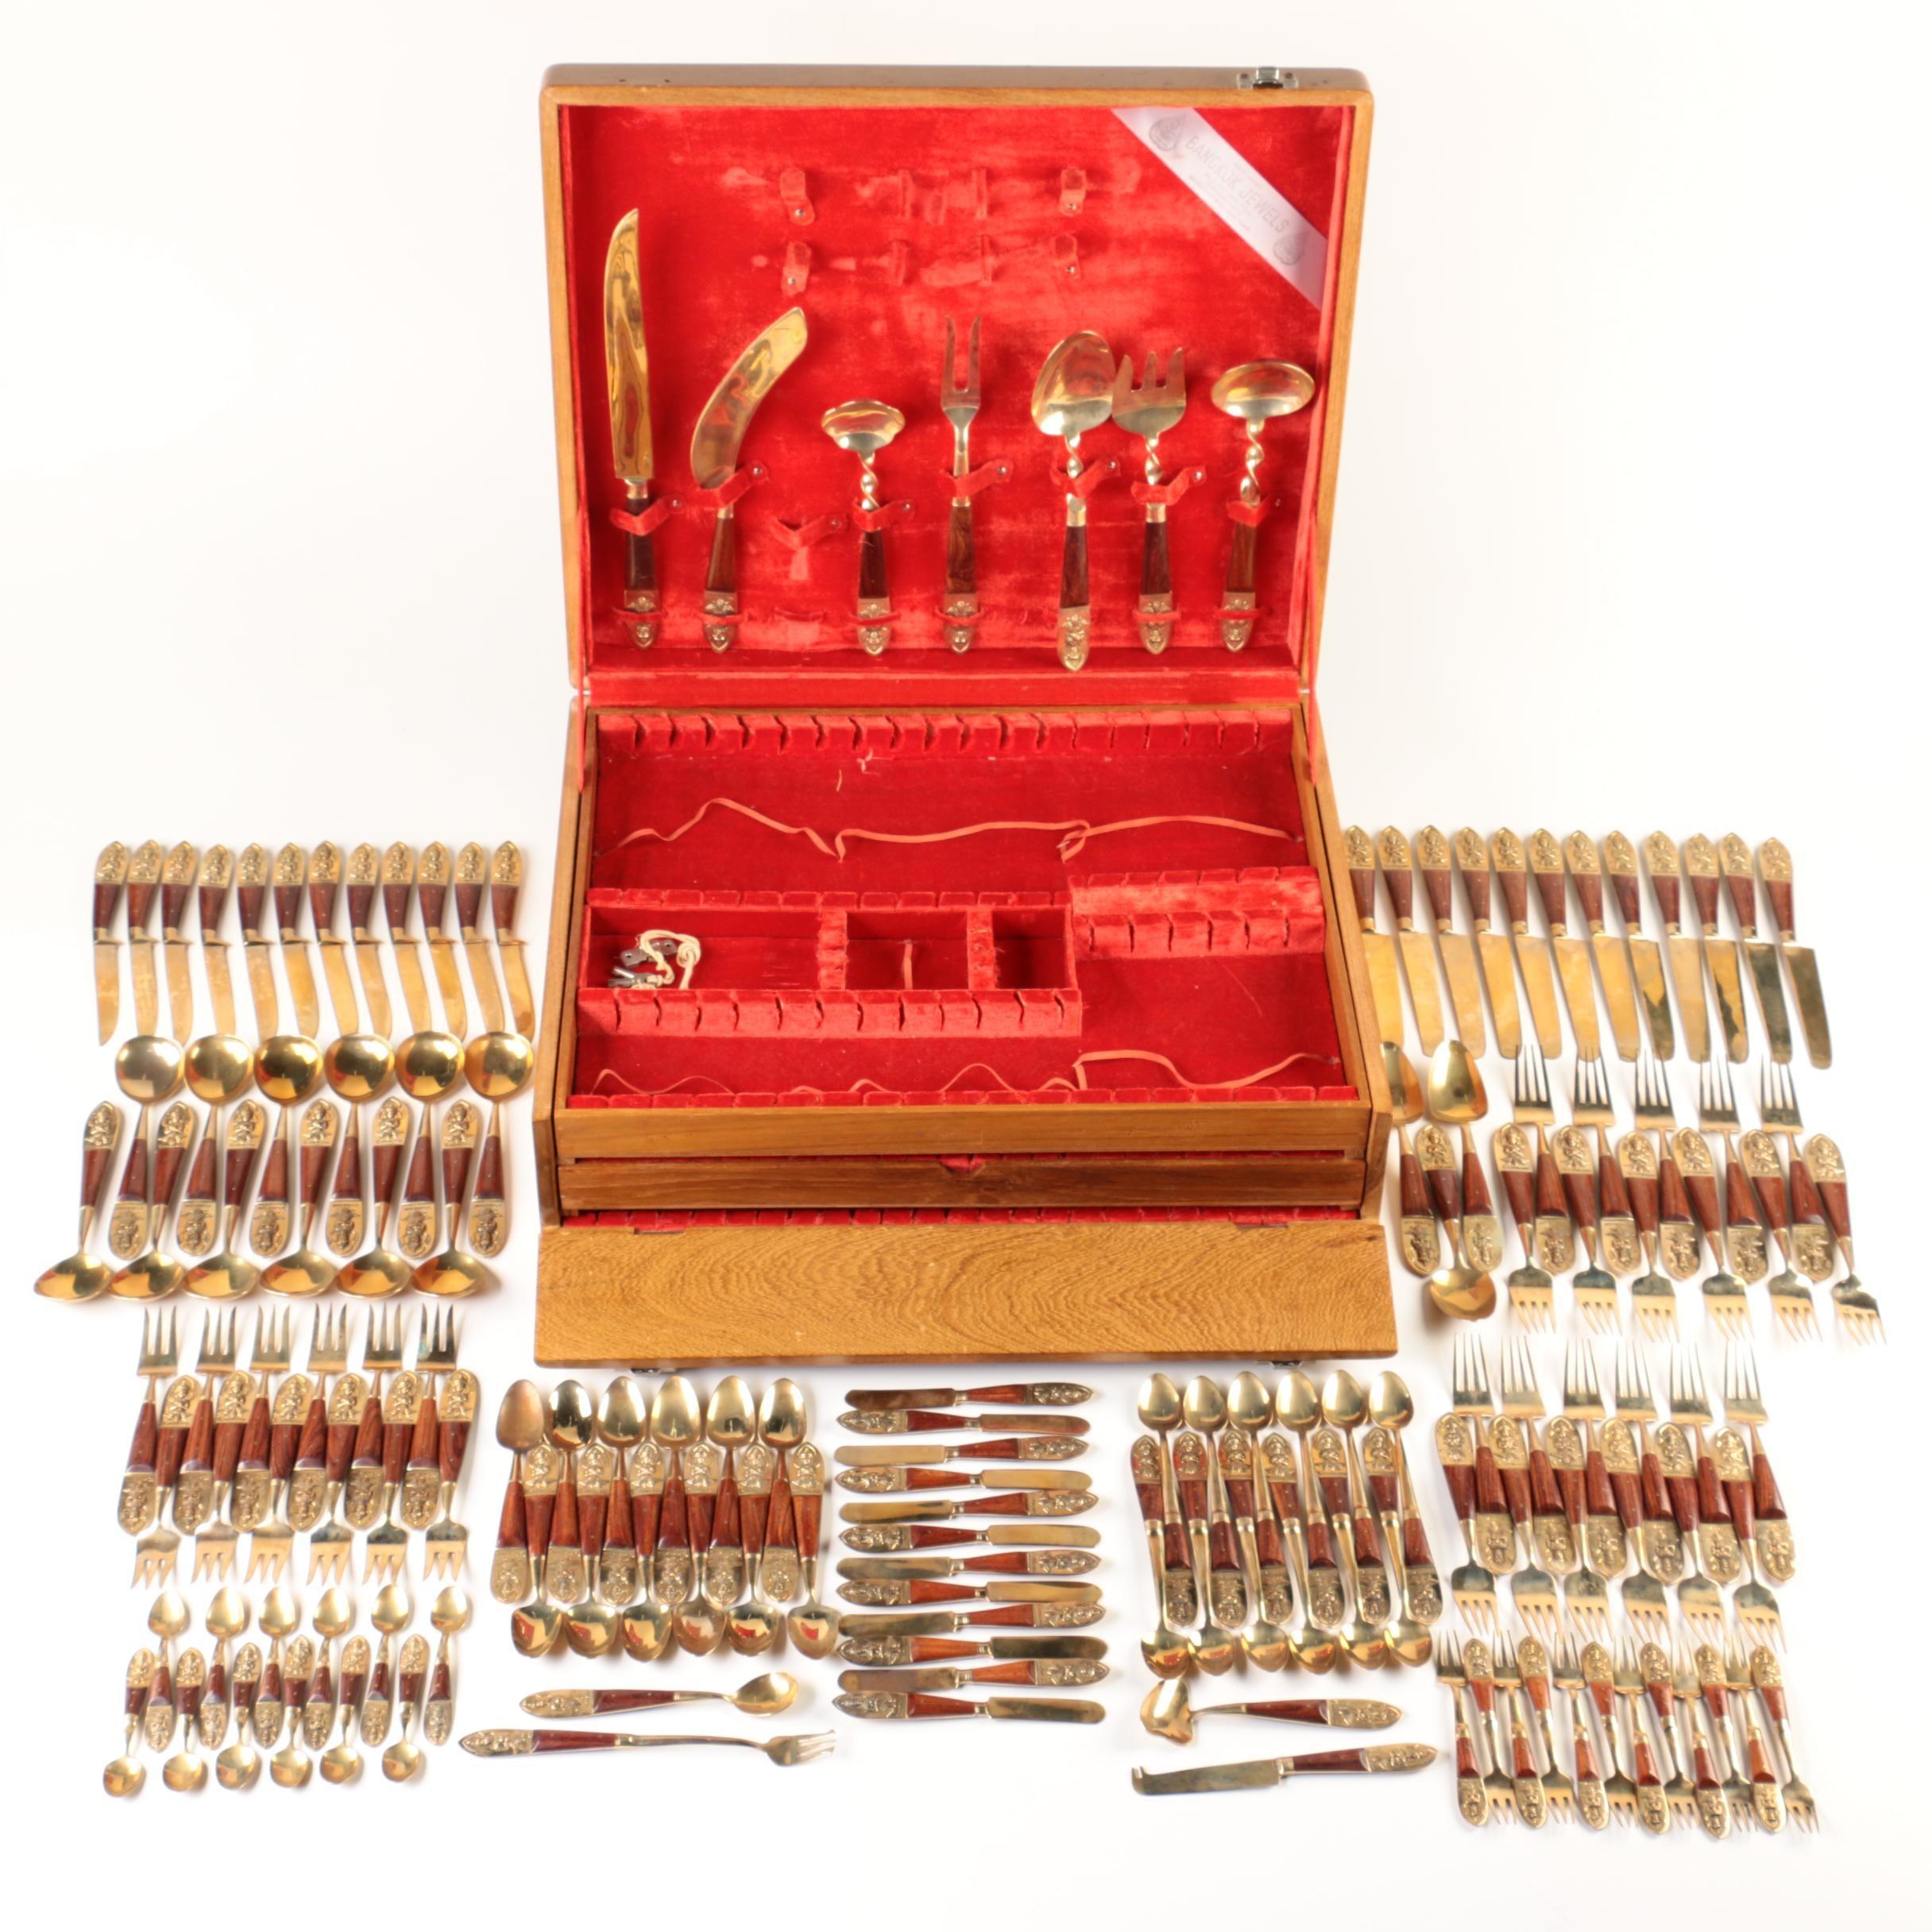 Thai Rosewood and Bronze Nickel Alloy Flatware Set